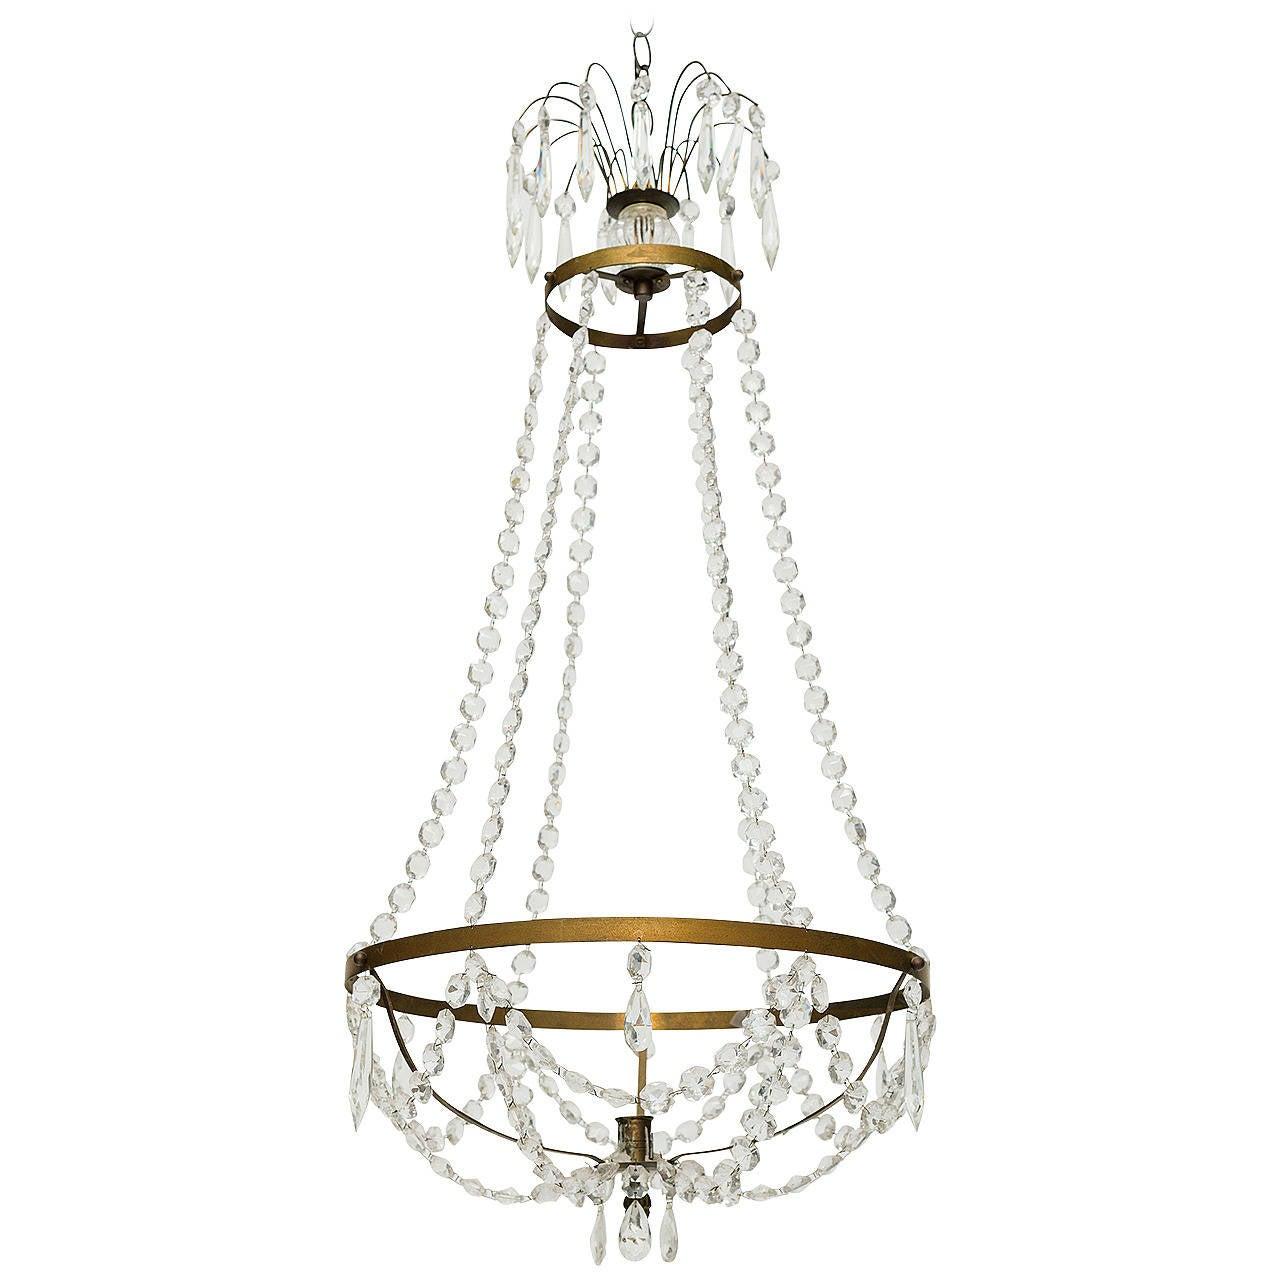 Swedish crystal light fixture at 1stdibs for Swedish light fixtures